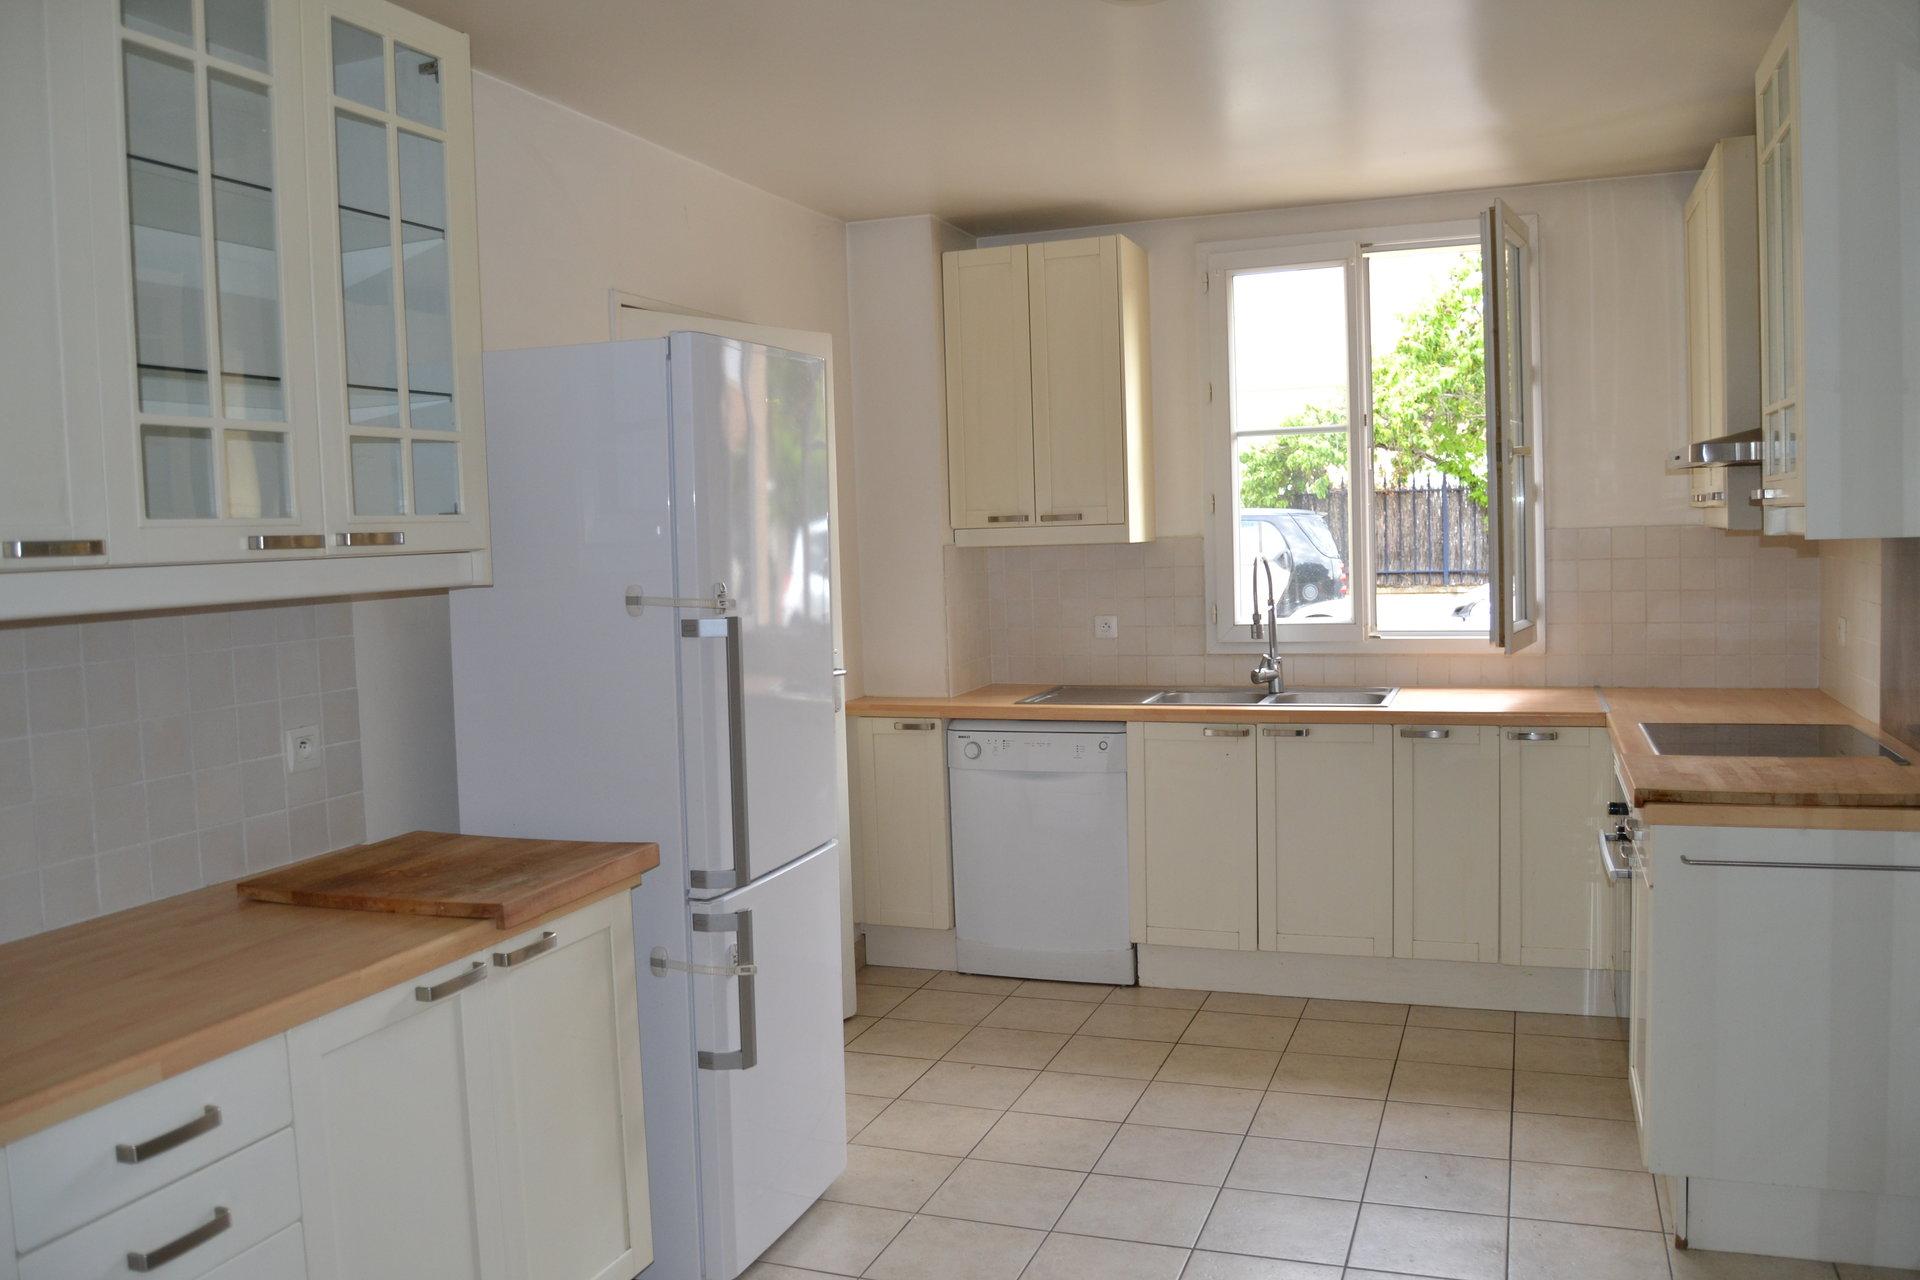 Location Maison - Croissy-sur-Seine